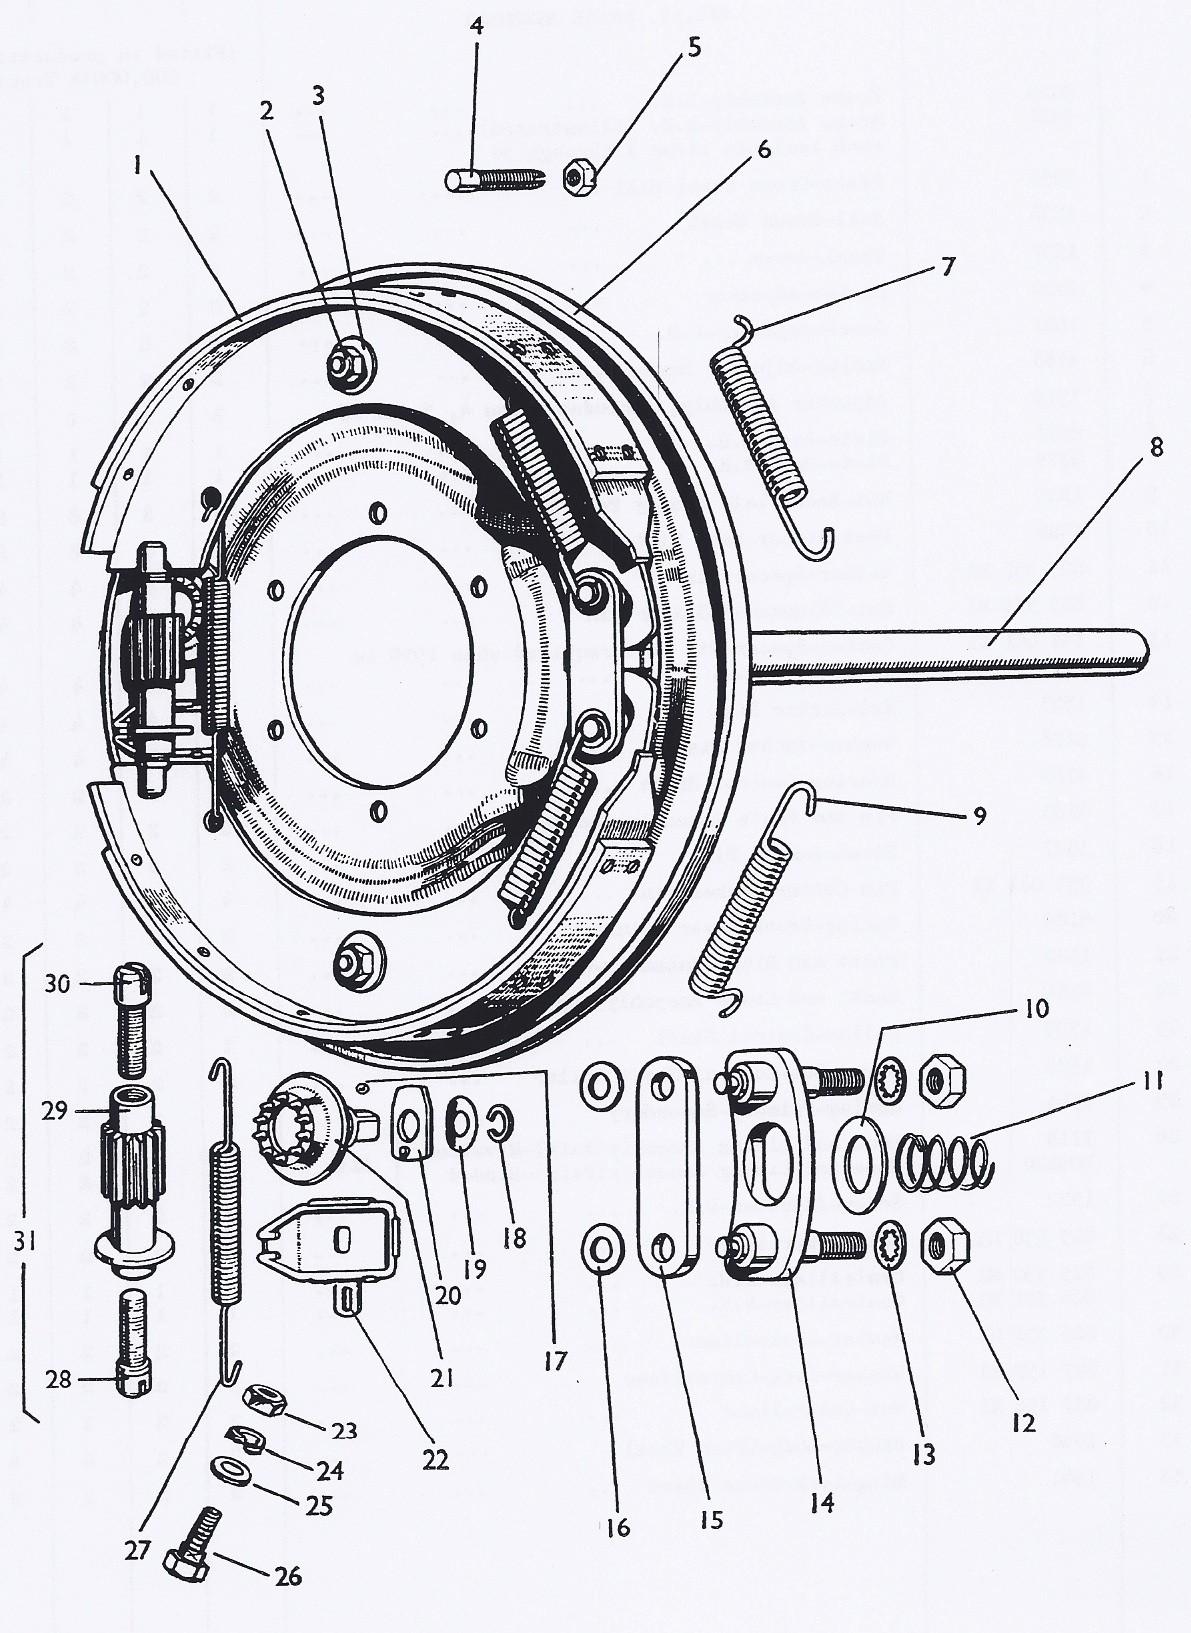 Car Brake Parts Diagram Wiring Electric Trailer Brakes Diagrams Splendi Race System Of